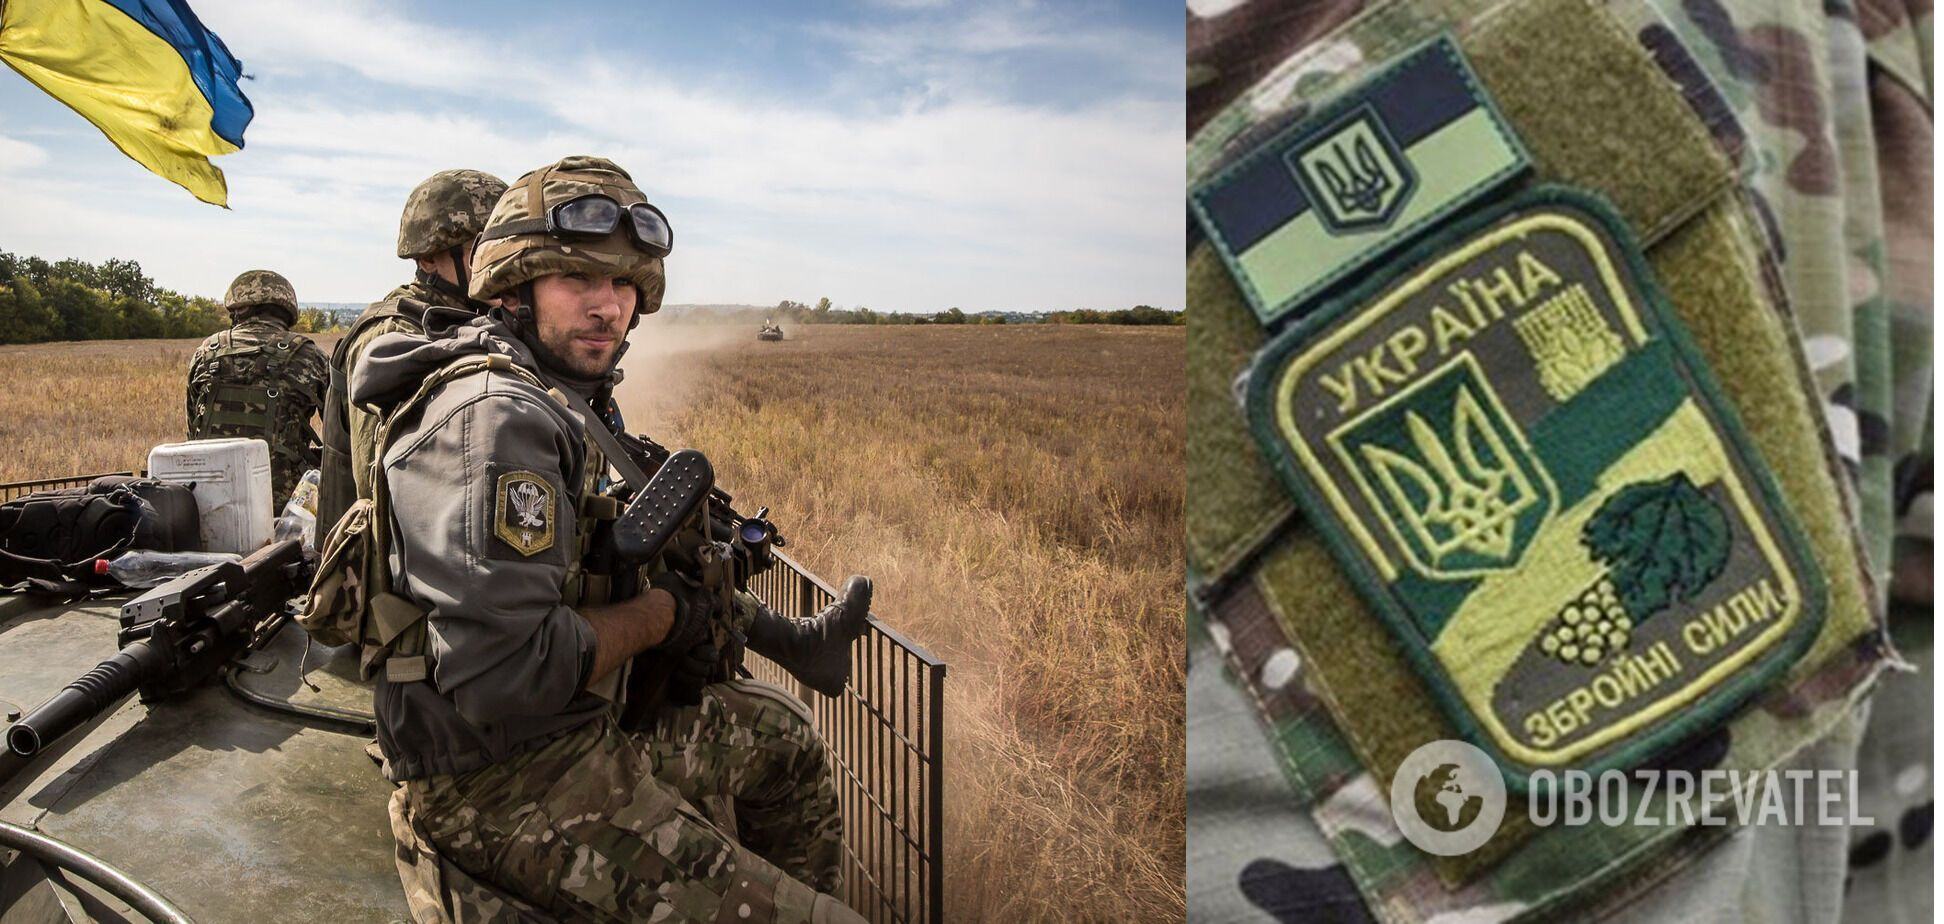 Спираючись на людей, не здатних на жертву заради України, влада приречена на поразку